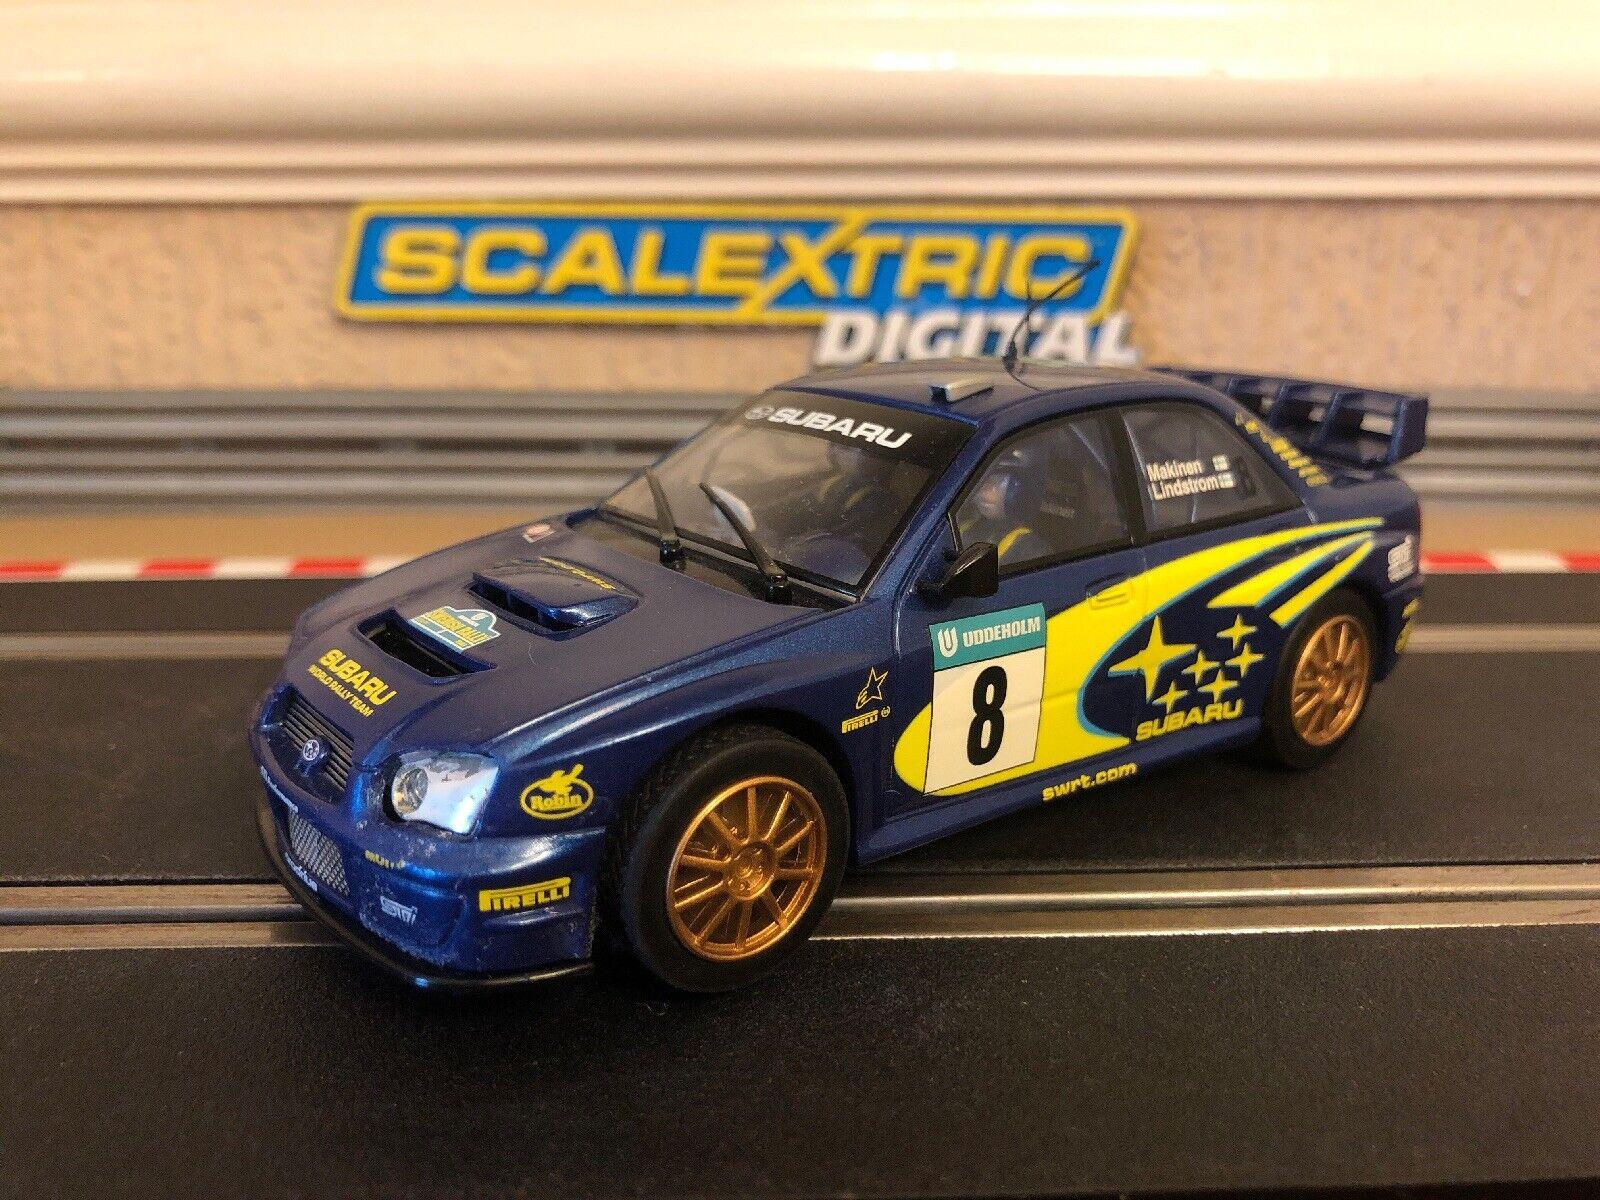 Scalcextric Digital Subaru Impreza WRC No8 Makinen & Lindstrom Mint Condition